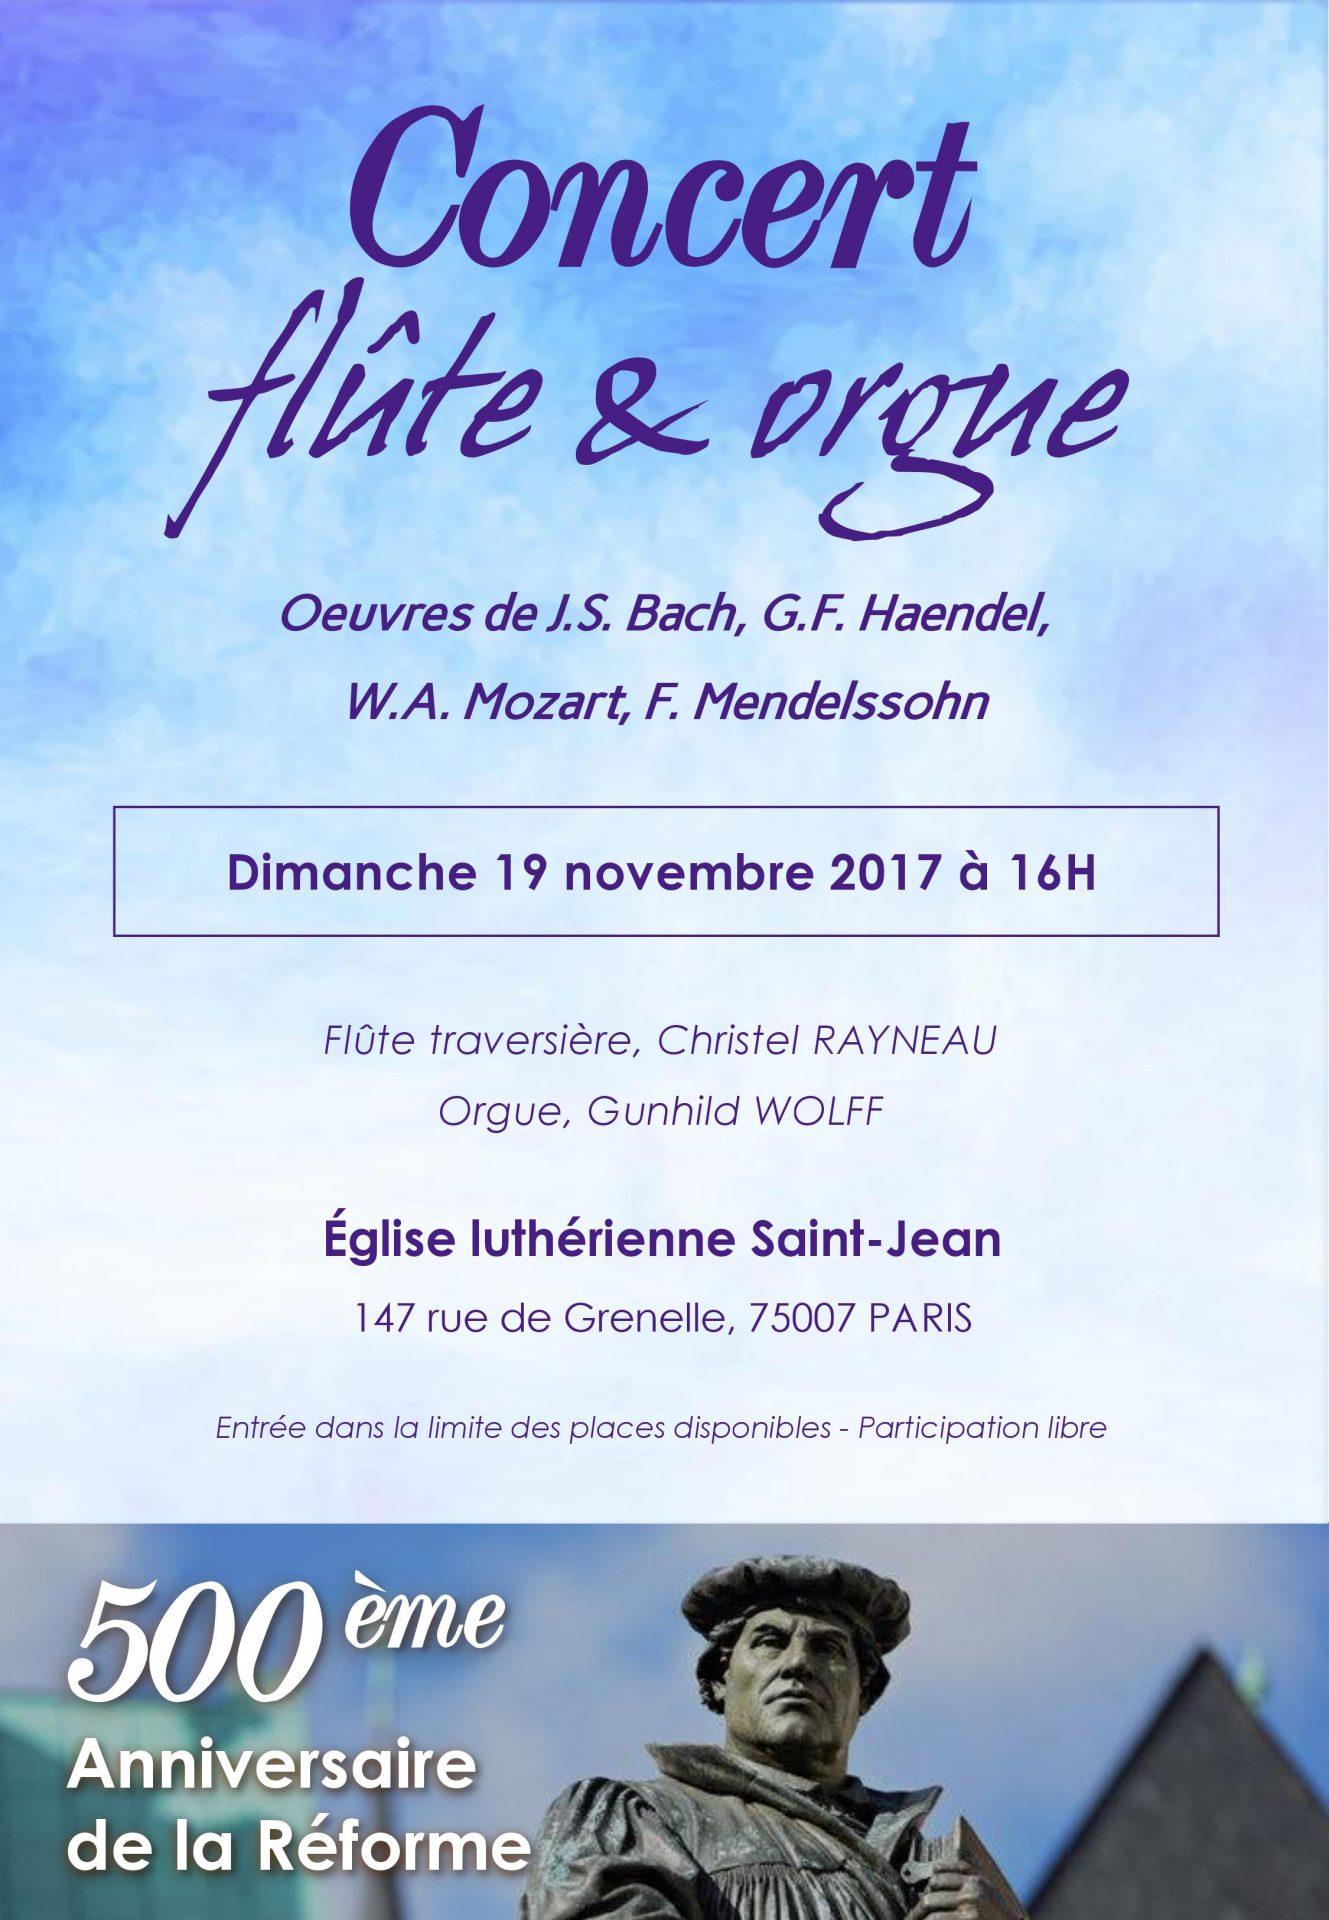 Concert orgue et flute 19 nov gunhild wolff christel rayneau